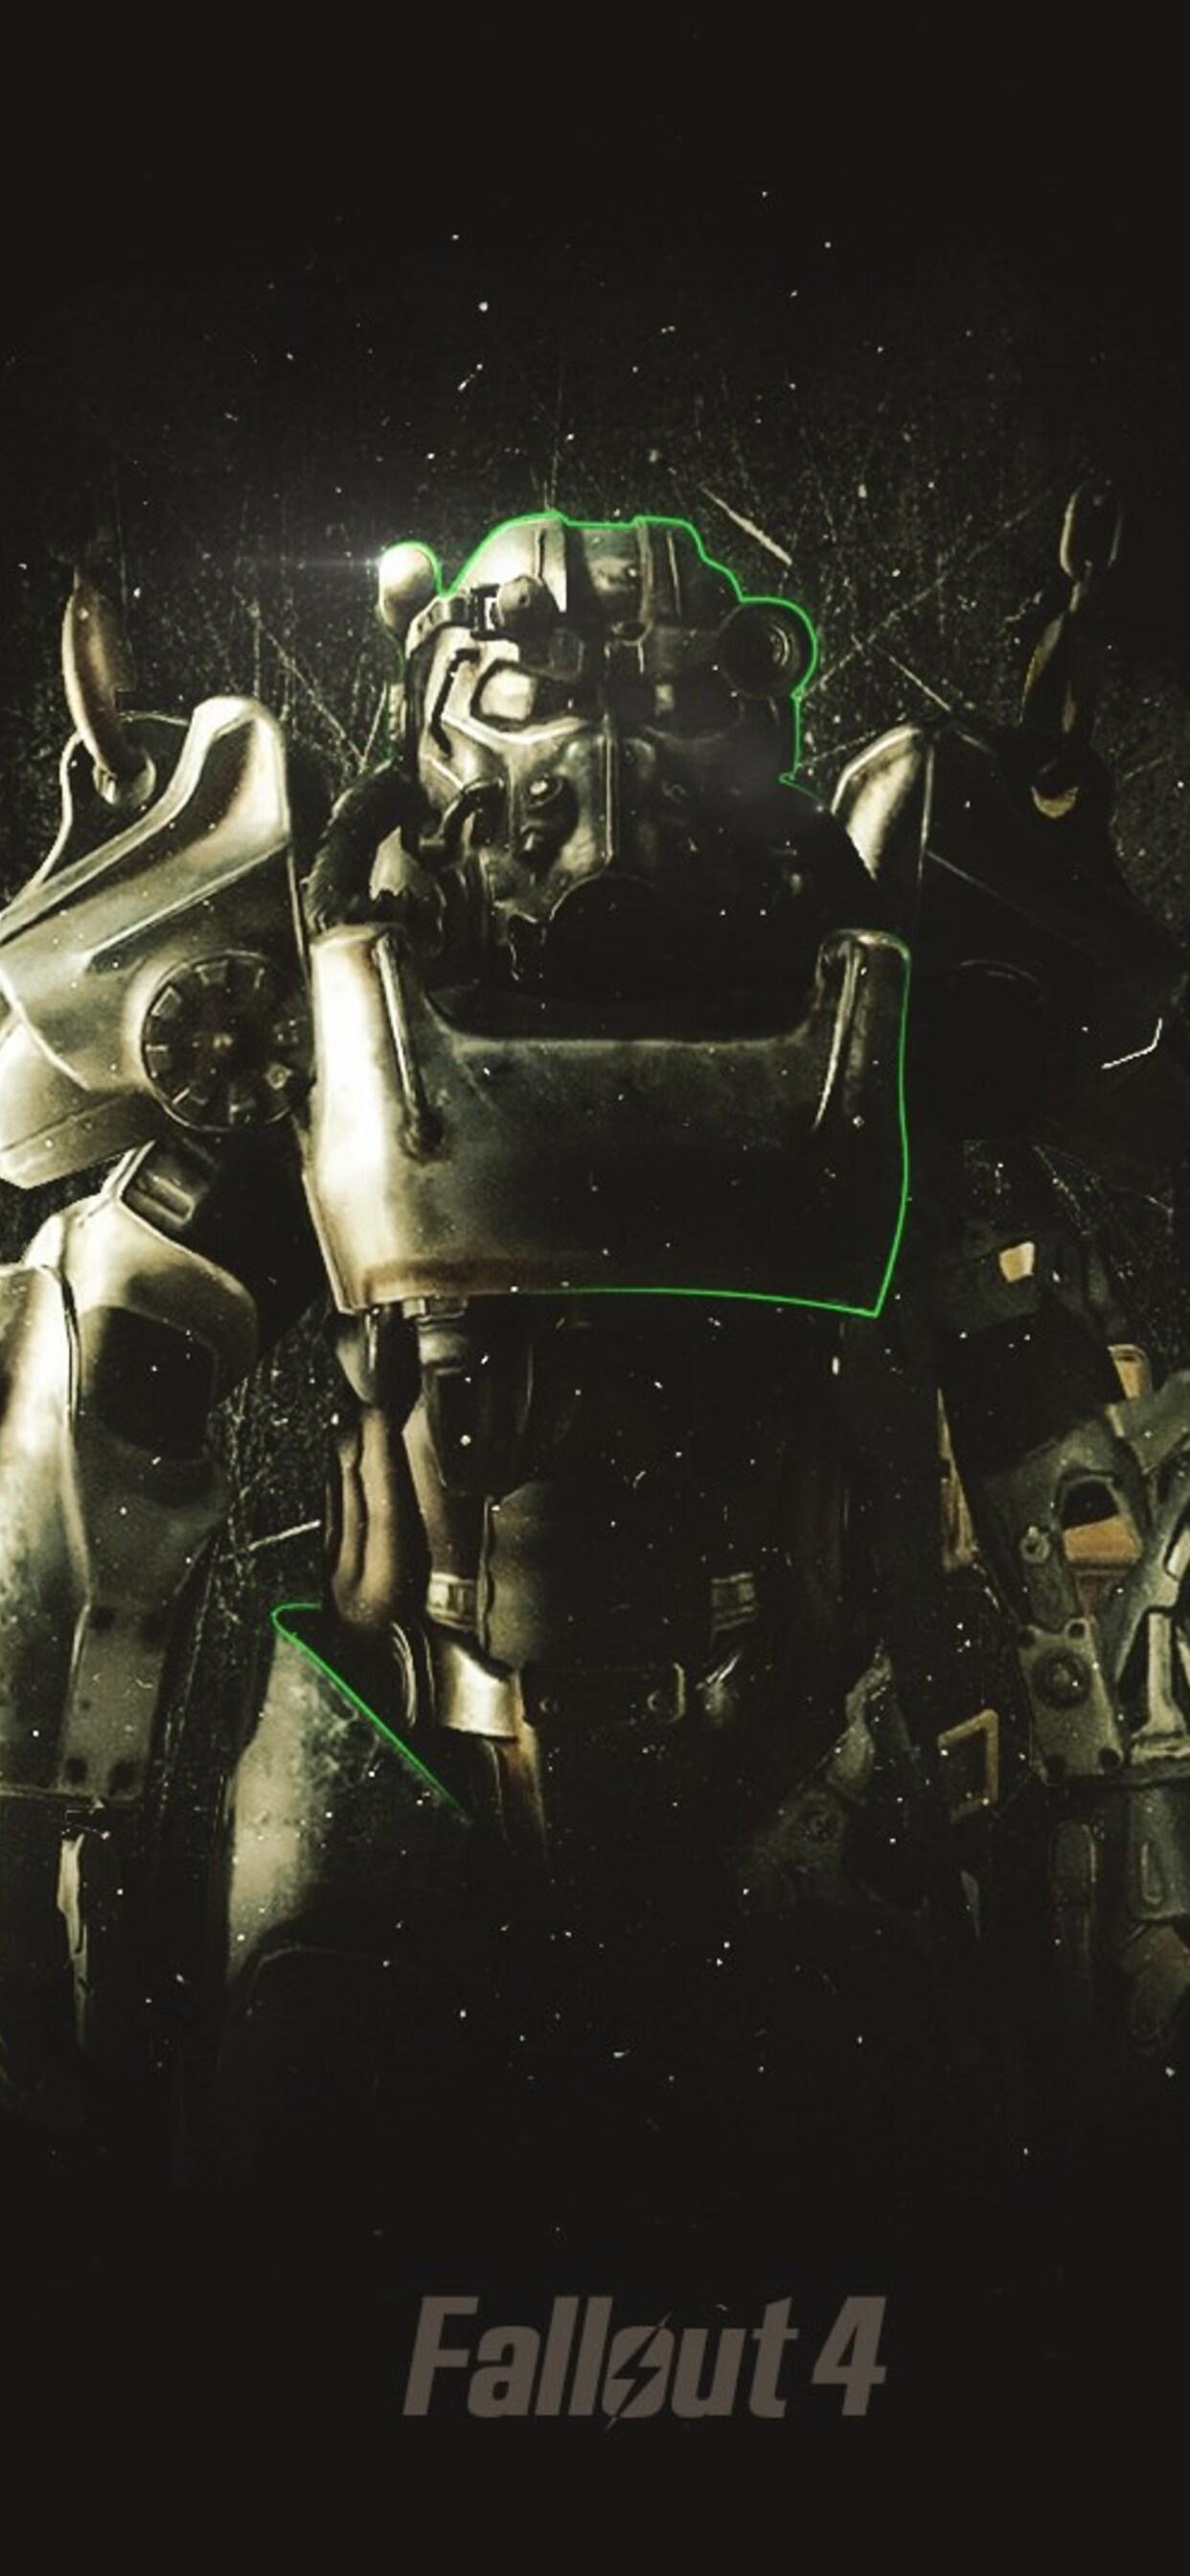 1242x2688 Fallout 4 Hd Iphone Xs Max Hd 4k Wallpapers